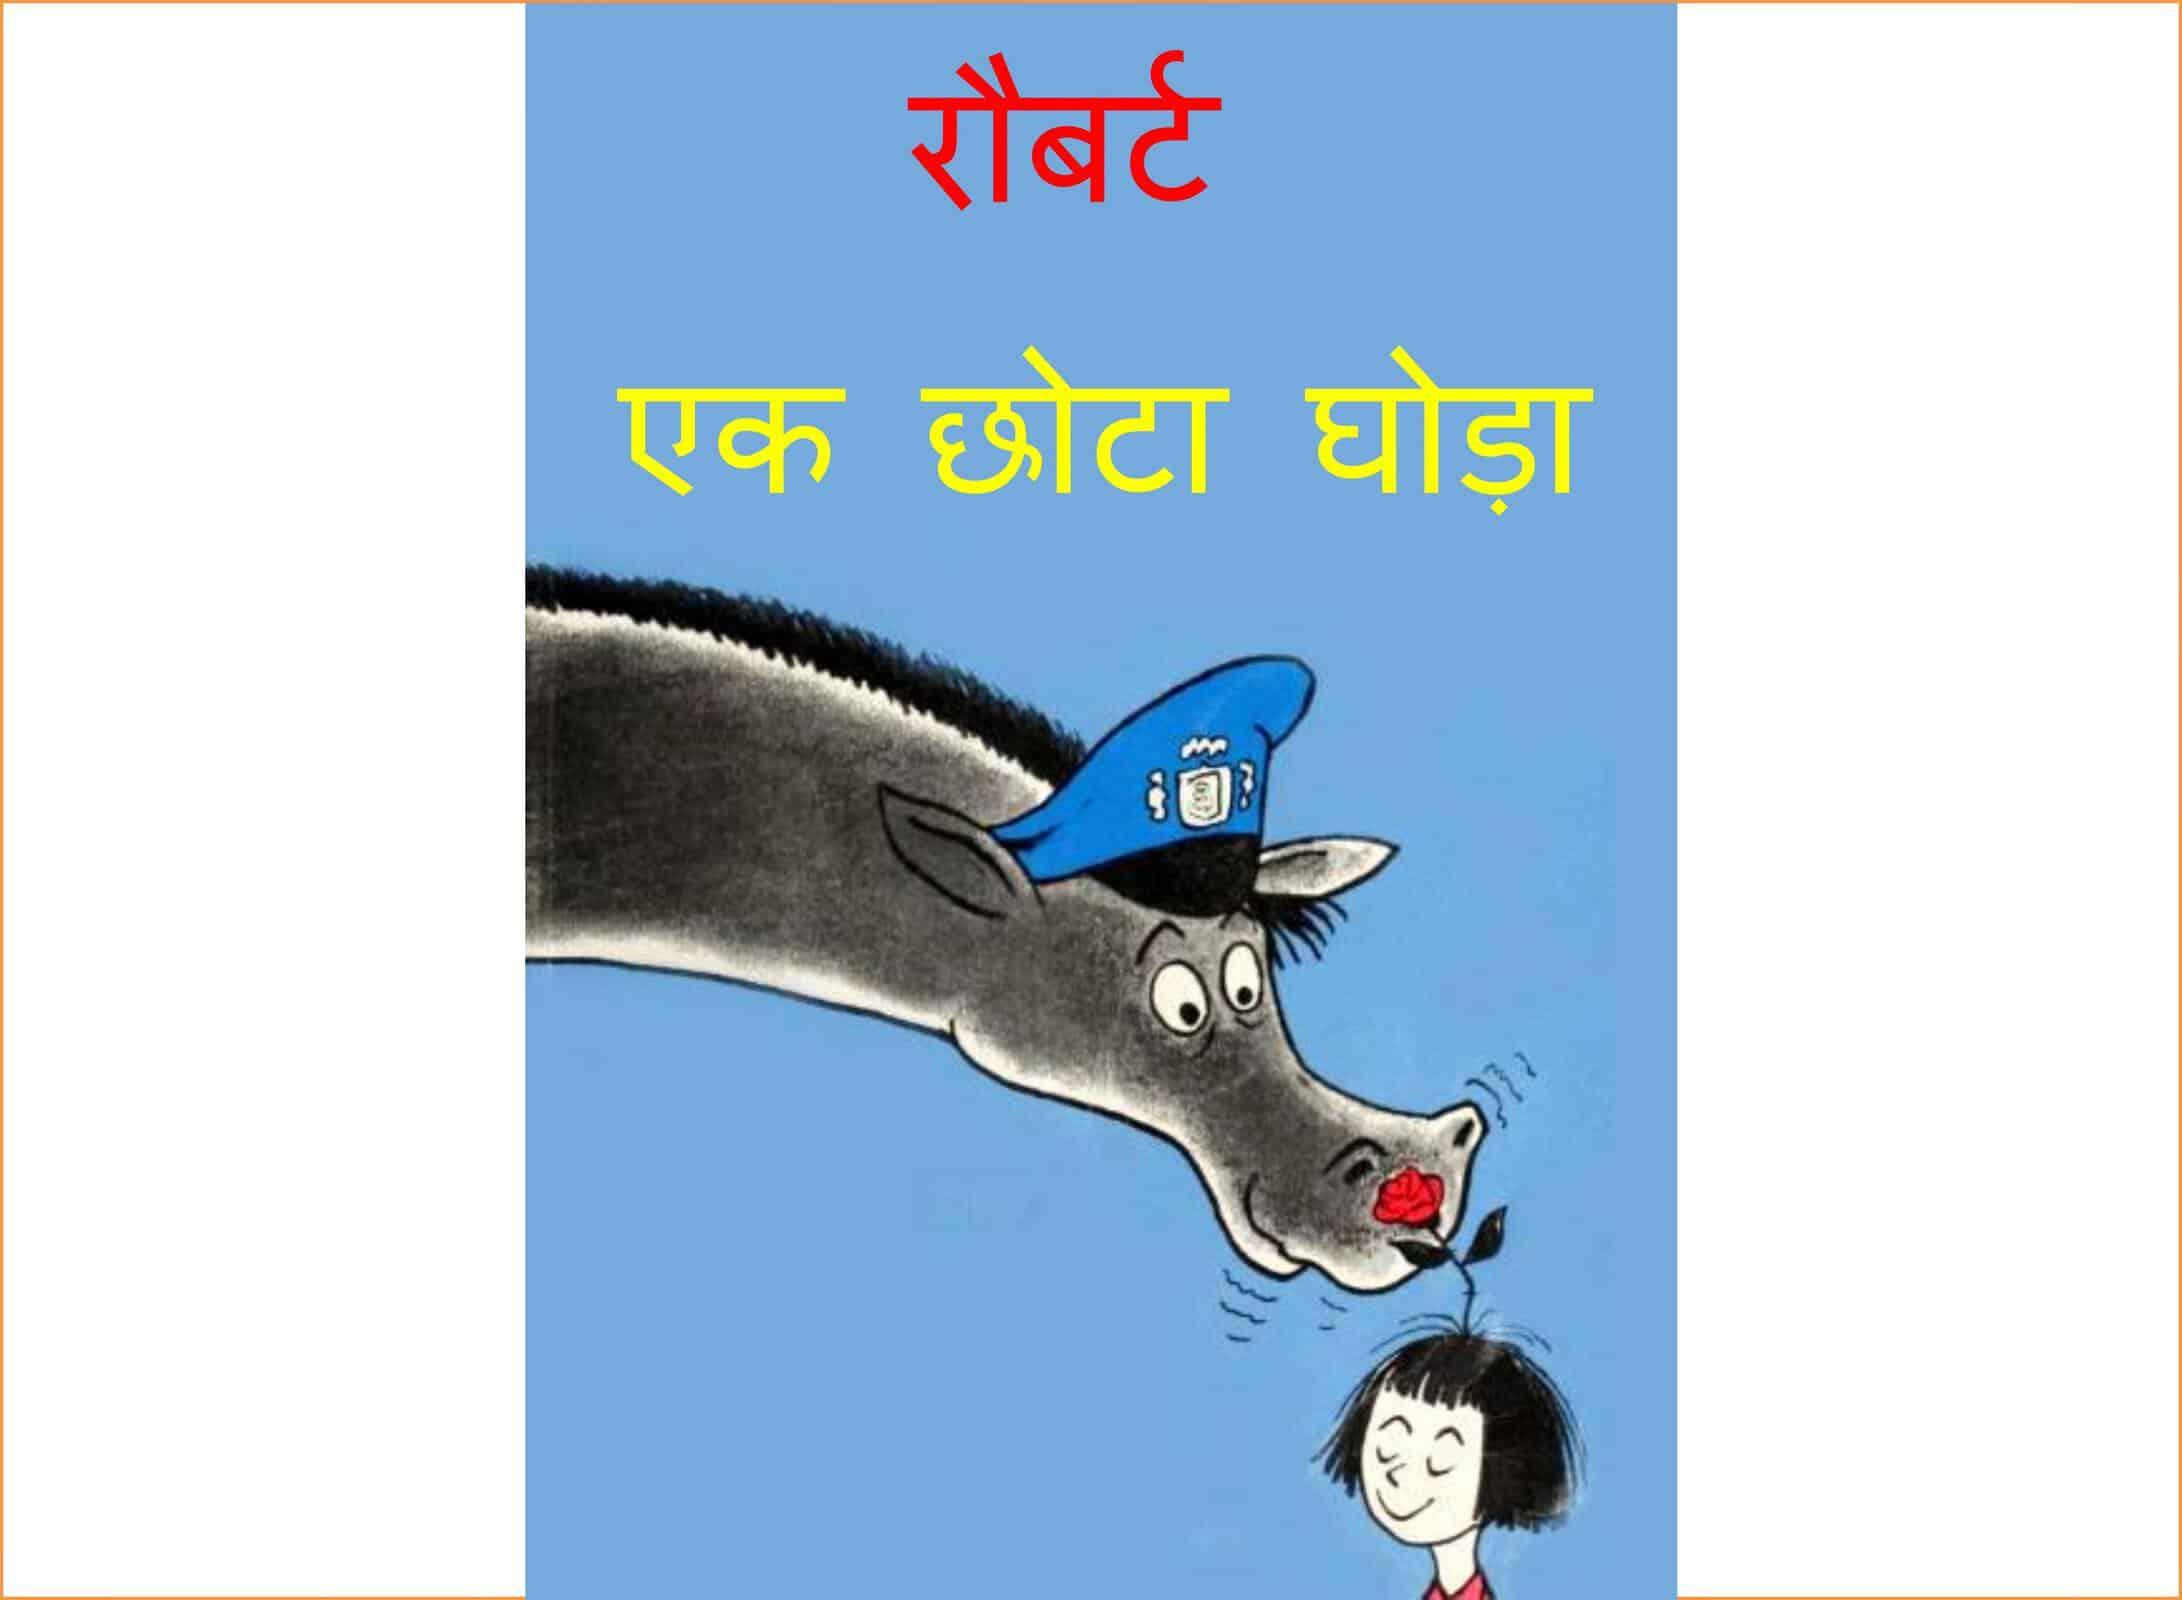 Robert - Ek Chhota Ghoda by पुस्तक समूह - Pustak Samuh